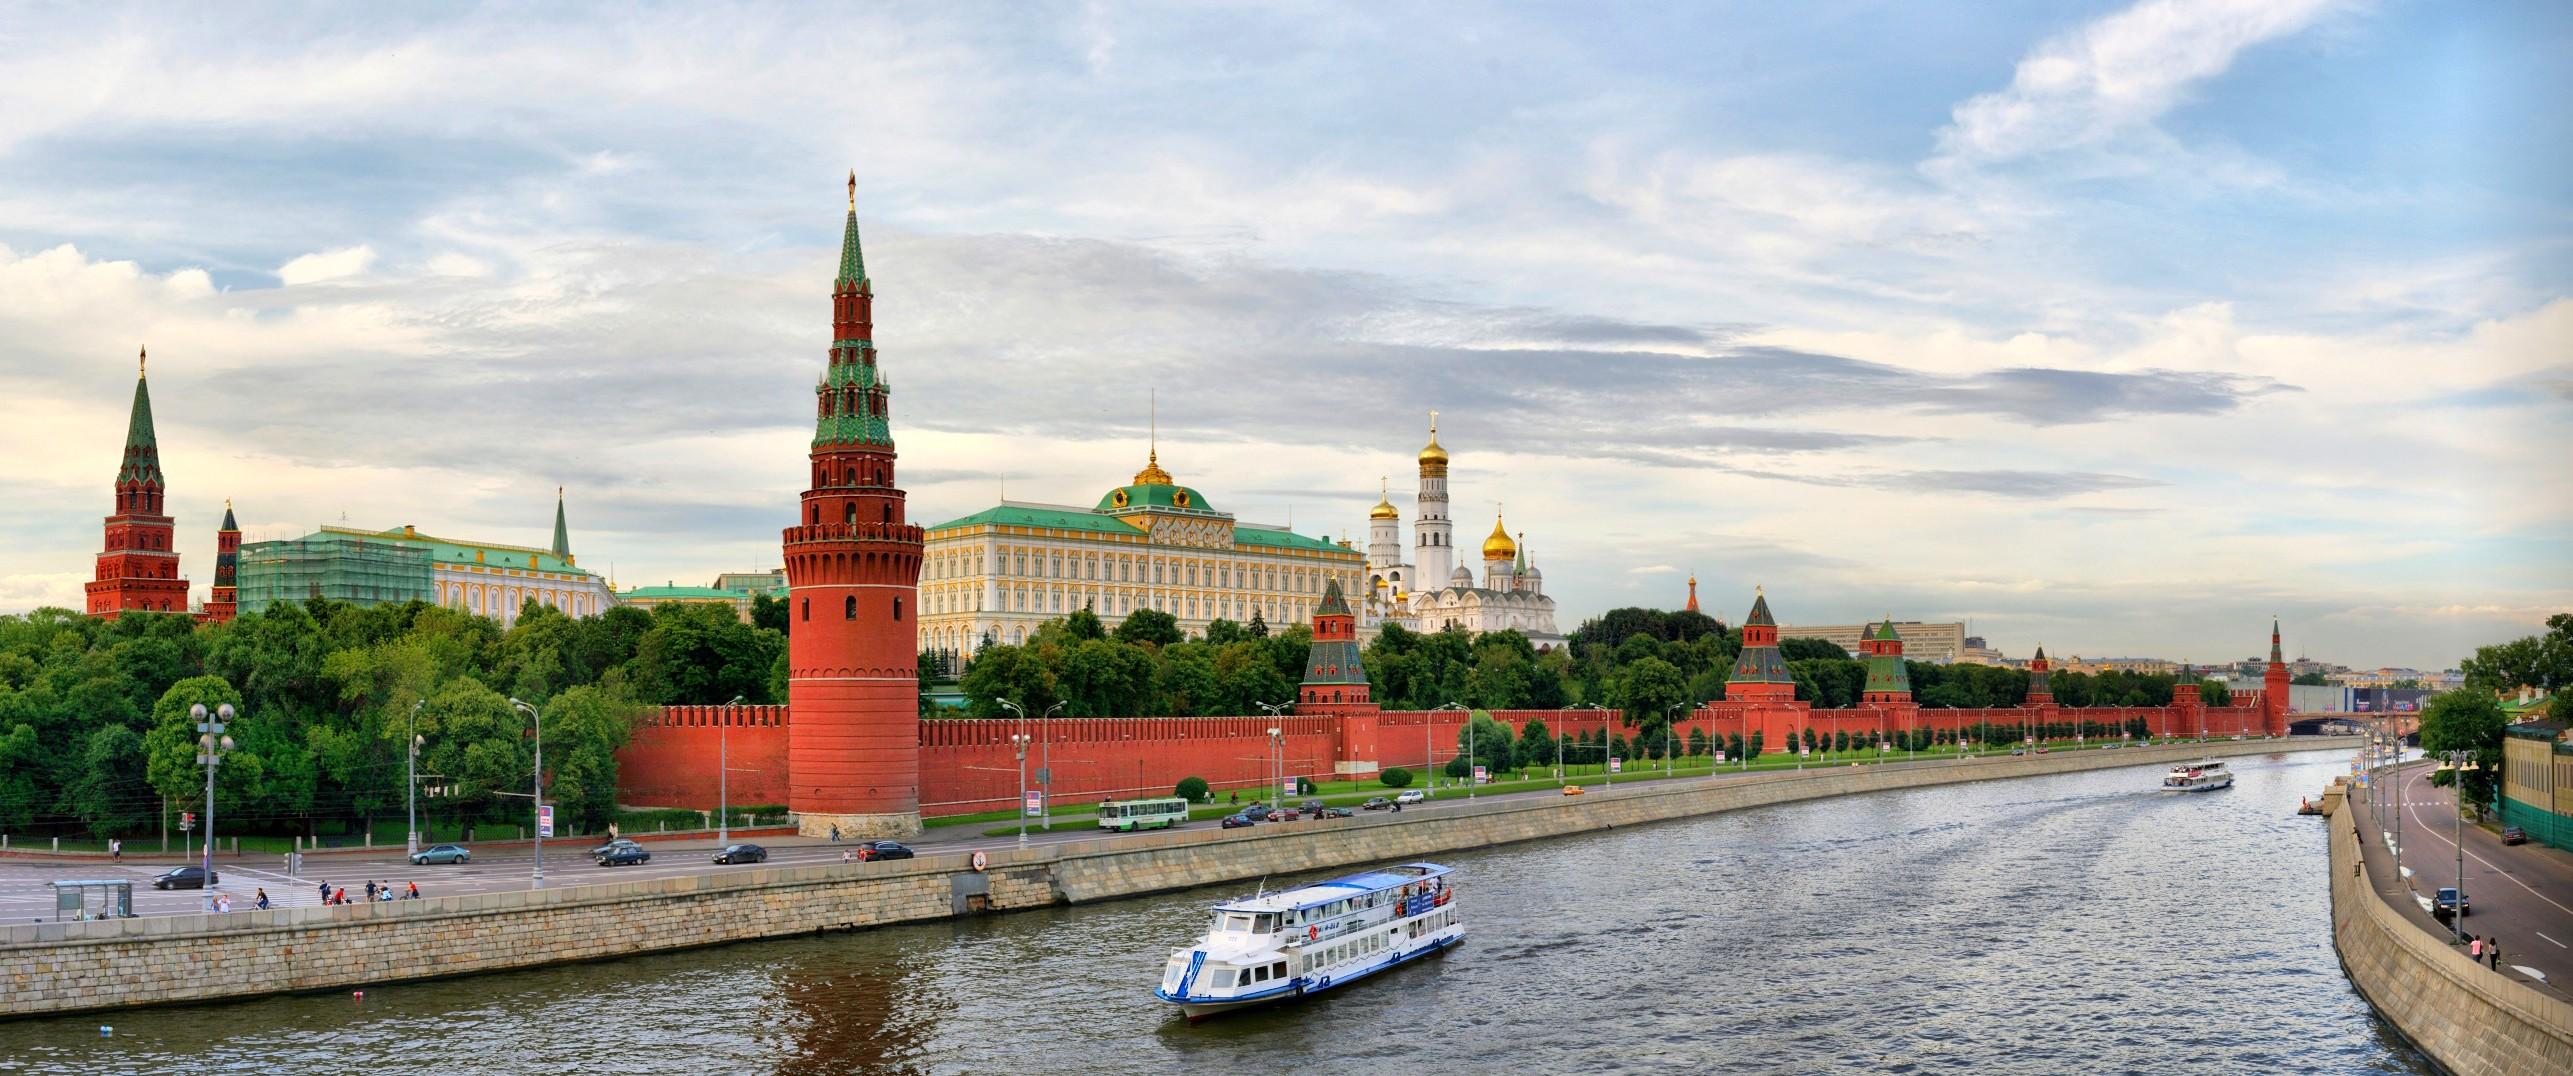 Moscow-photo-Vladimir-Fofanov-sxc-hu-e1341297054443